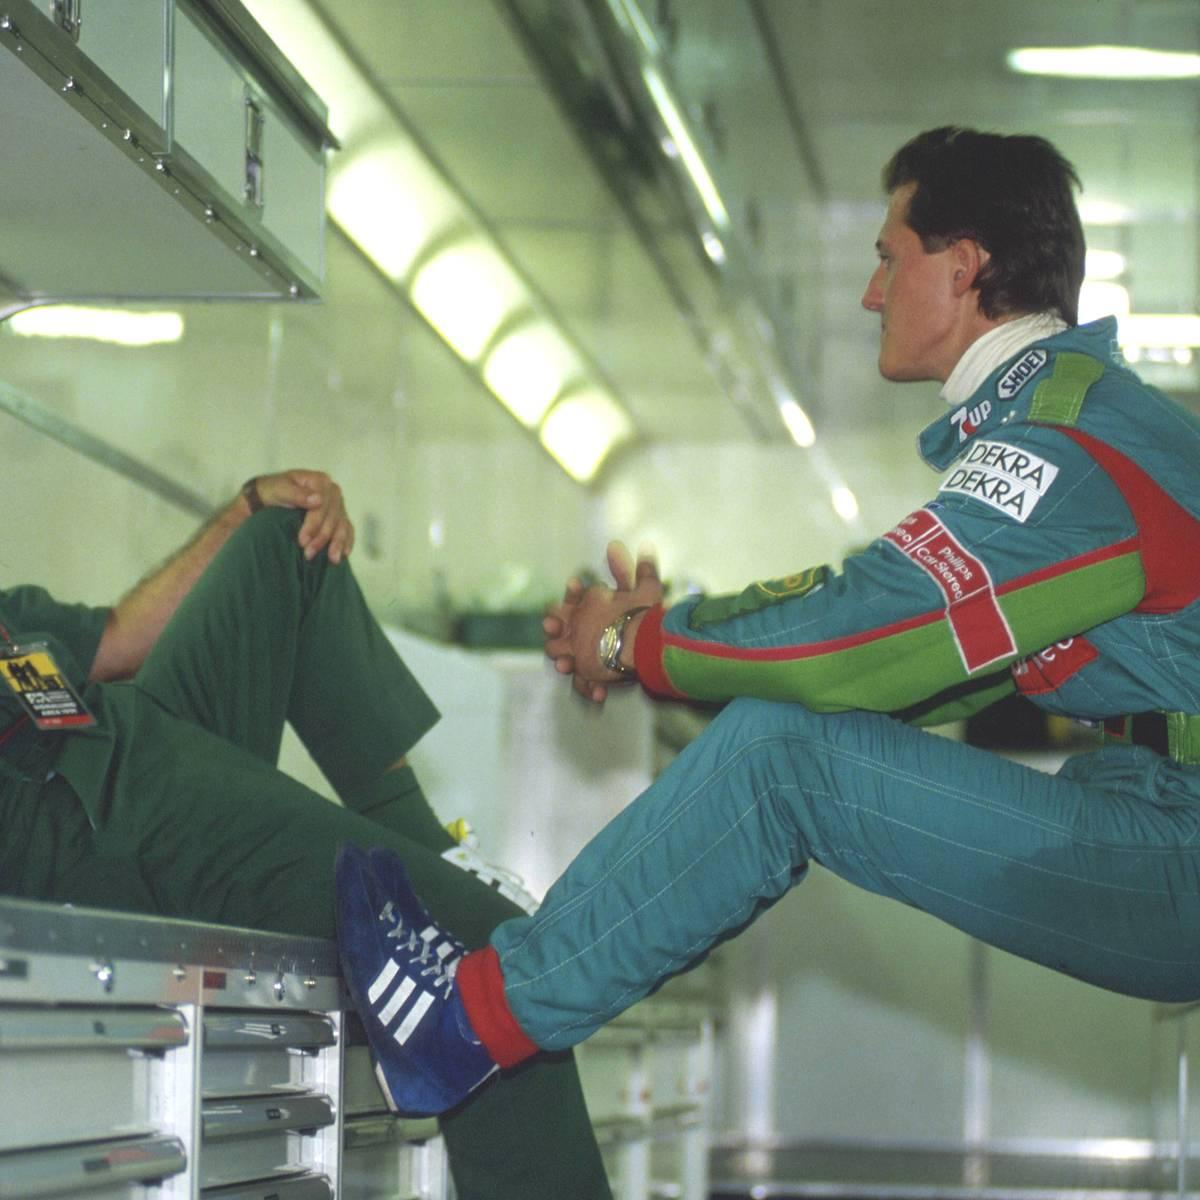 Bester F1-Fahrer? Jordan hat Favorit